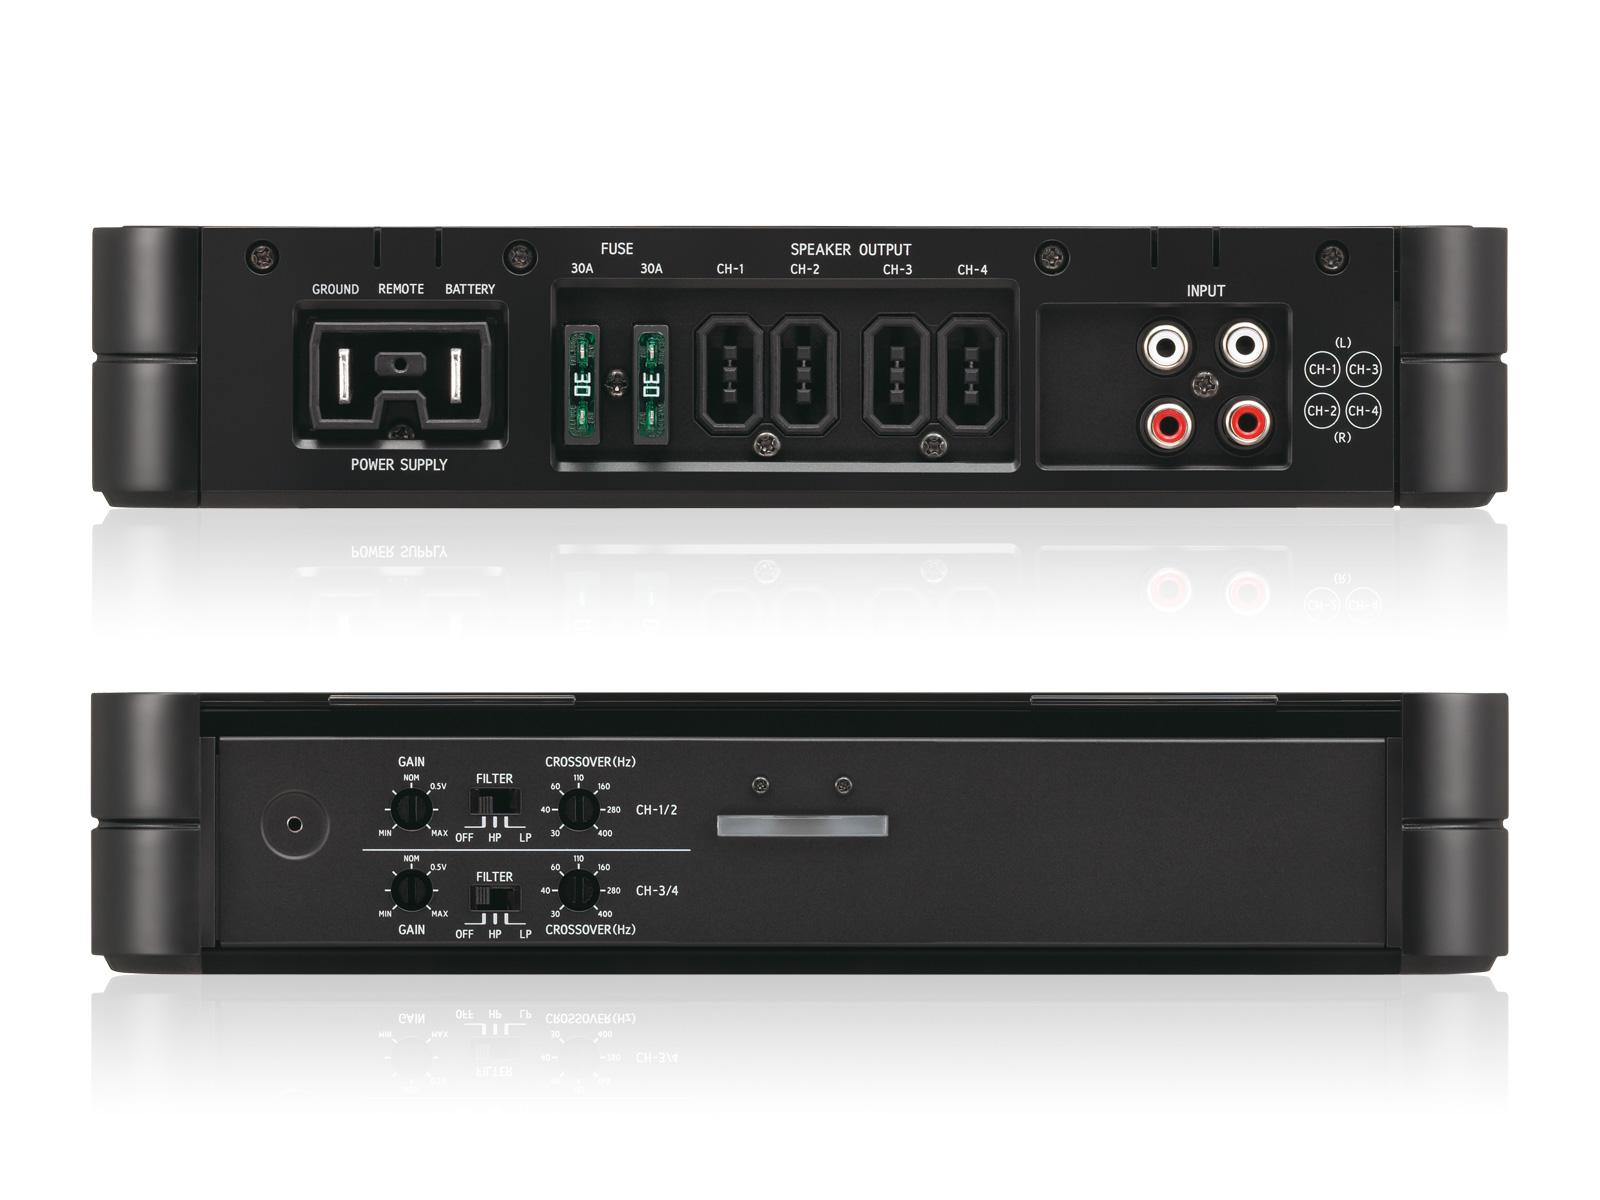 [FPWZ_2684]  4/3/2 Channel Power Density Digital Amplifier - Alpine - PDX-F4 | Alpine Pdx M12 Wiring Diagram |  | Alpine Electronics